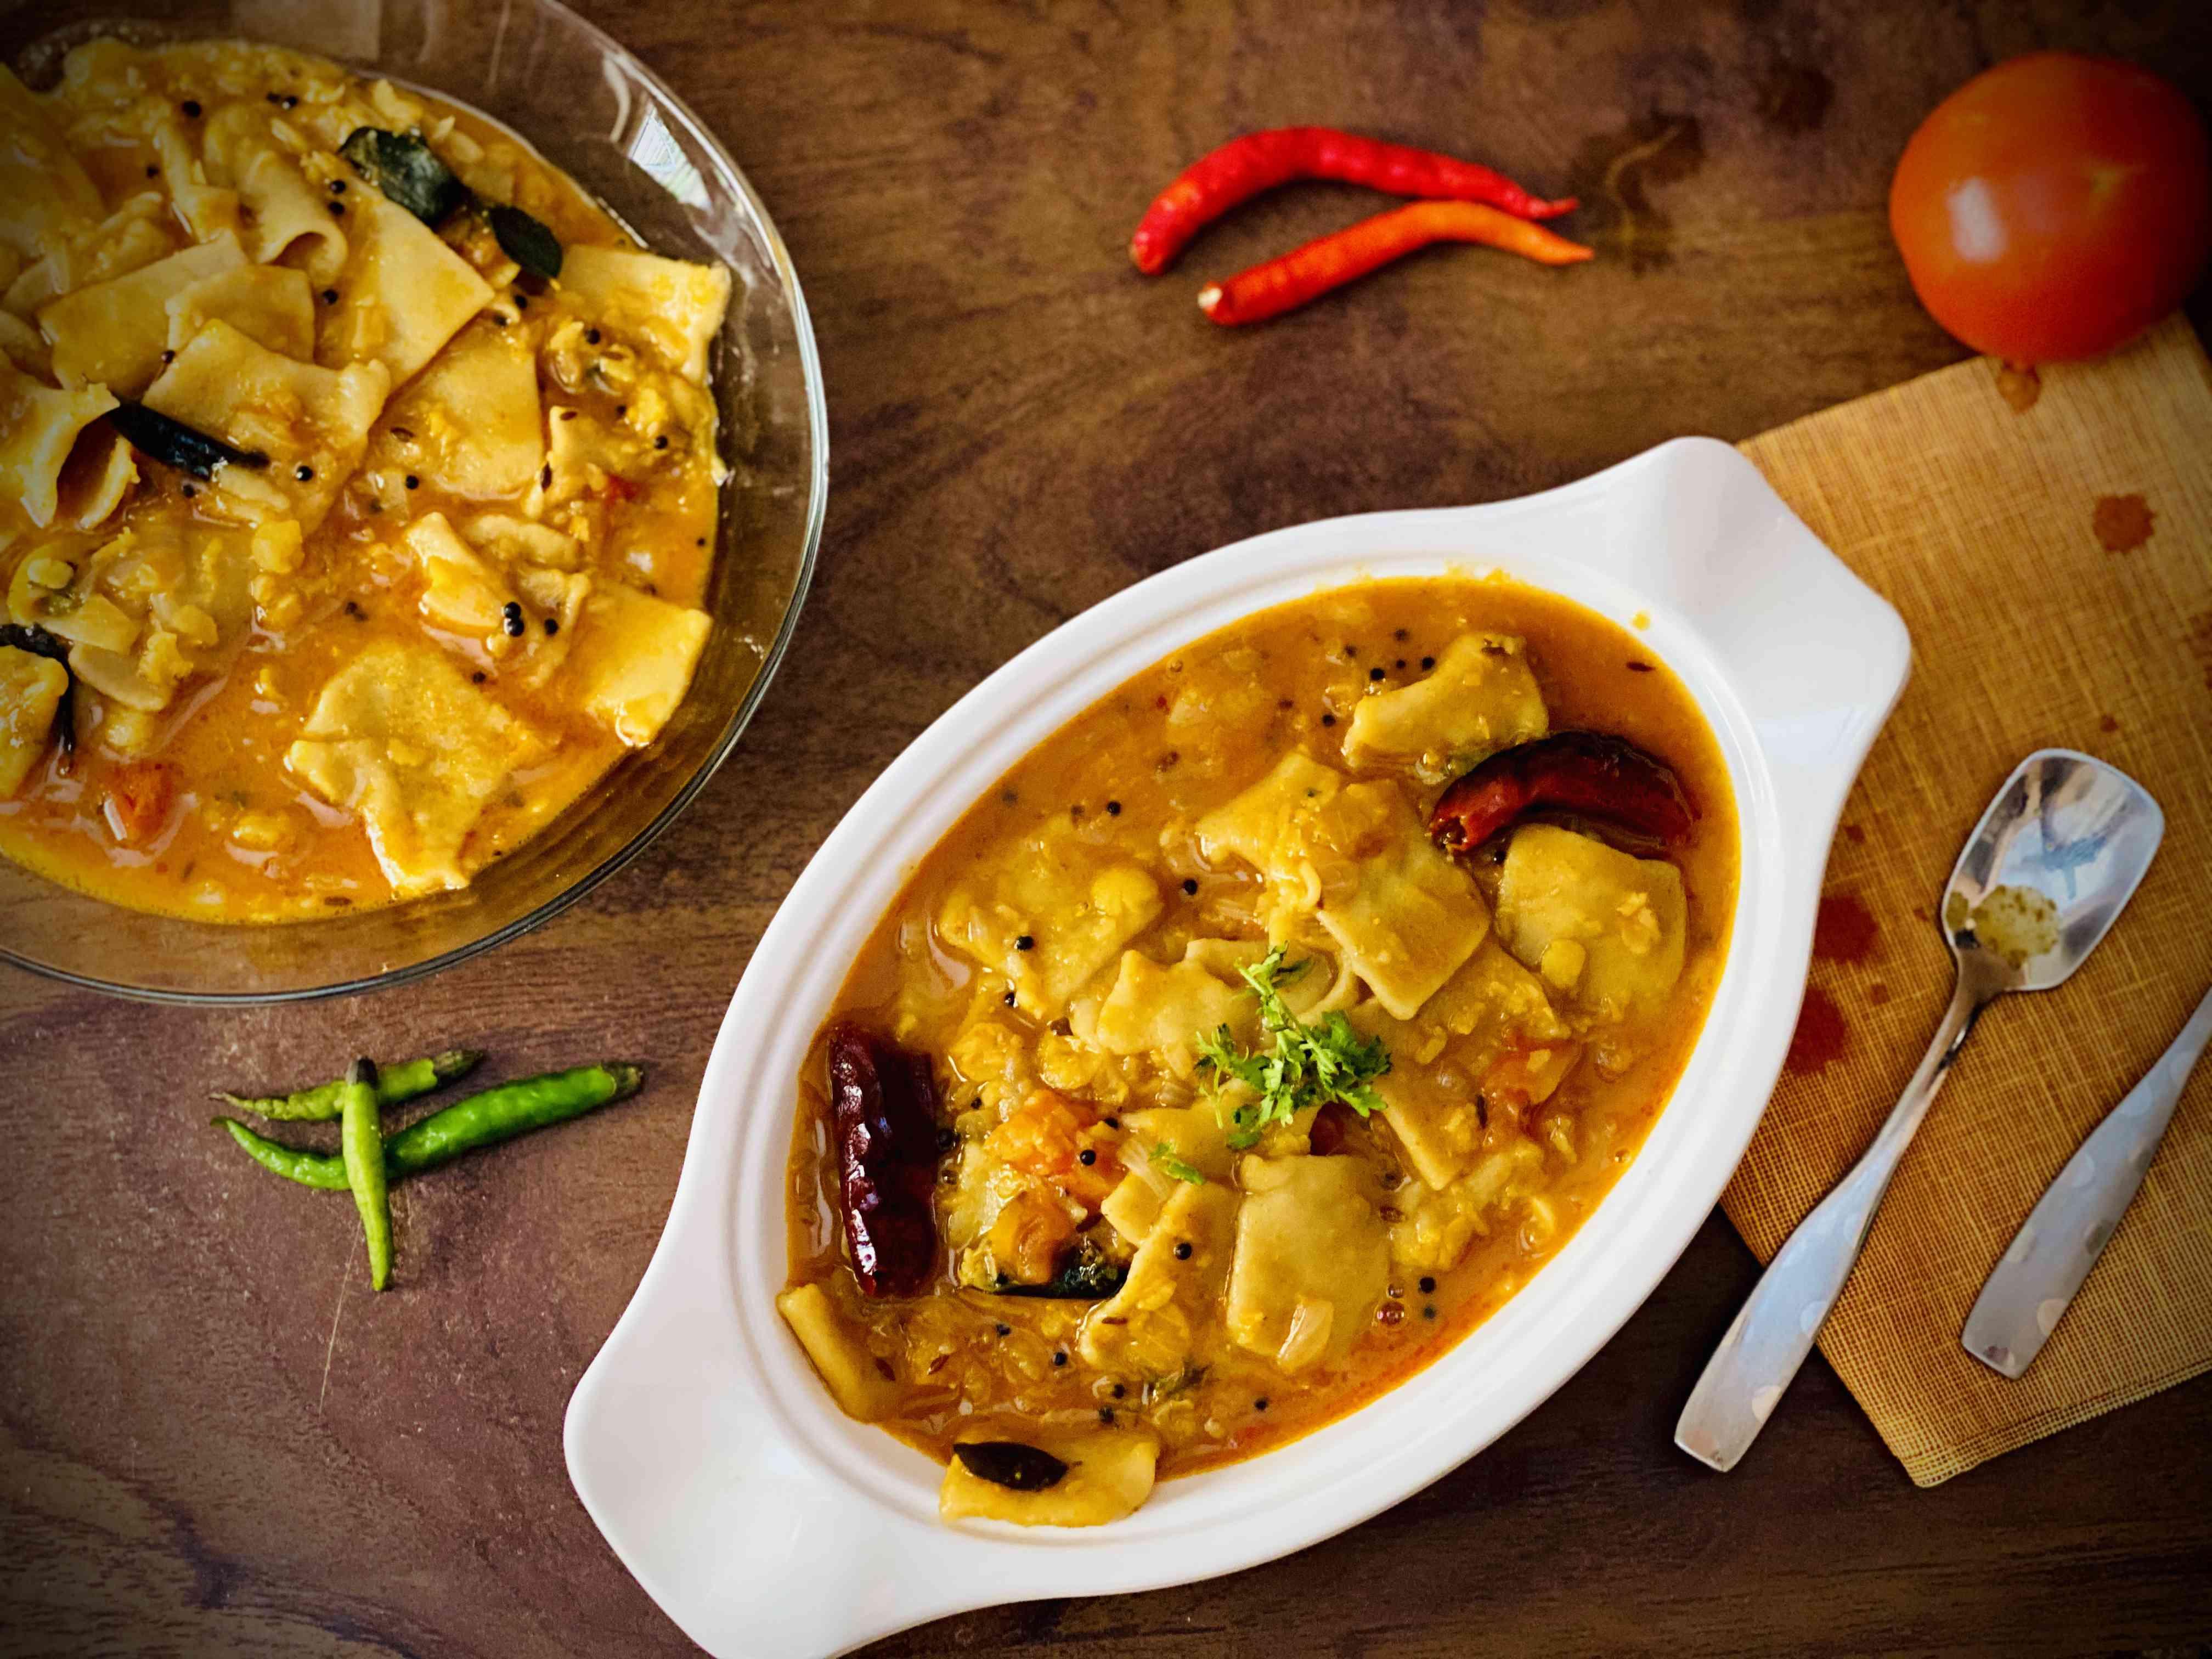 Dal Dhokli Indian Full Meal Wheat Pasta